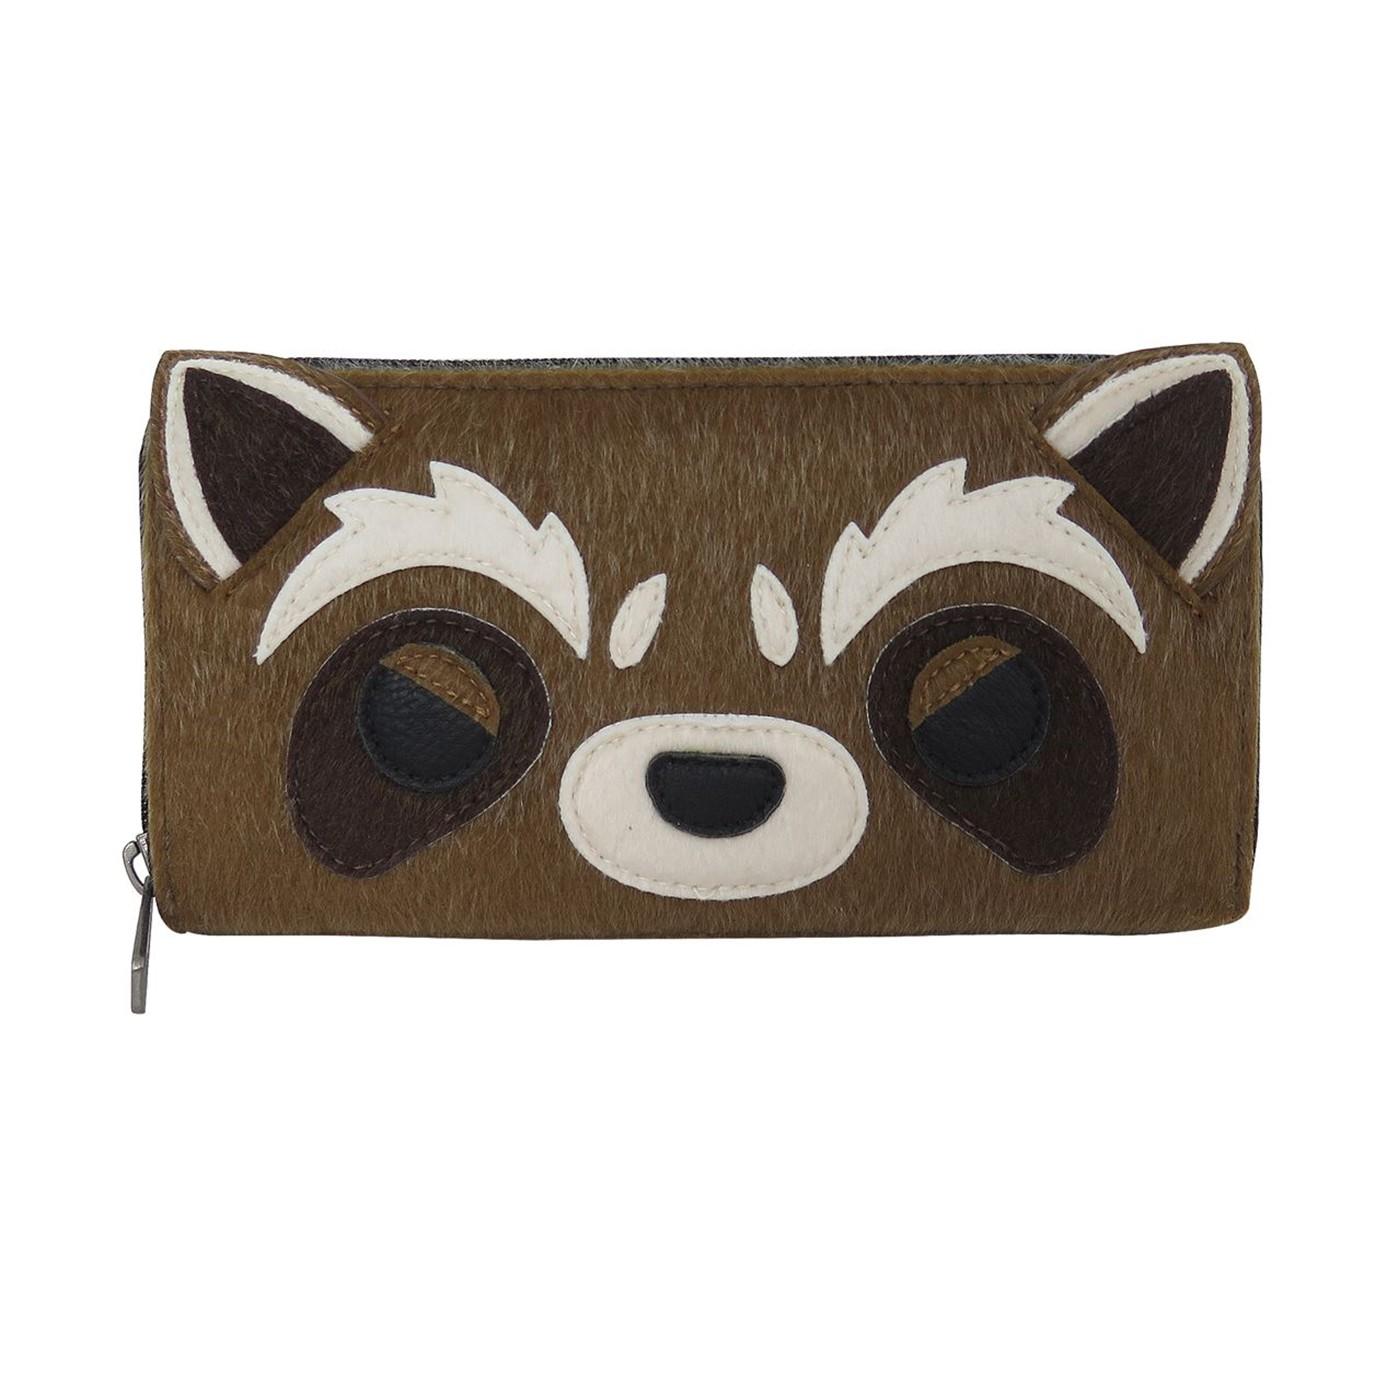 GOTG Rocket Raccoon Loungefly Zip Around Wallet